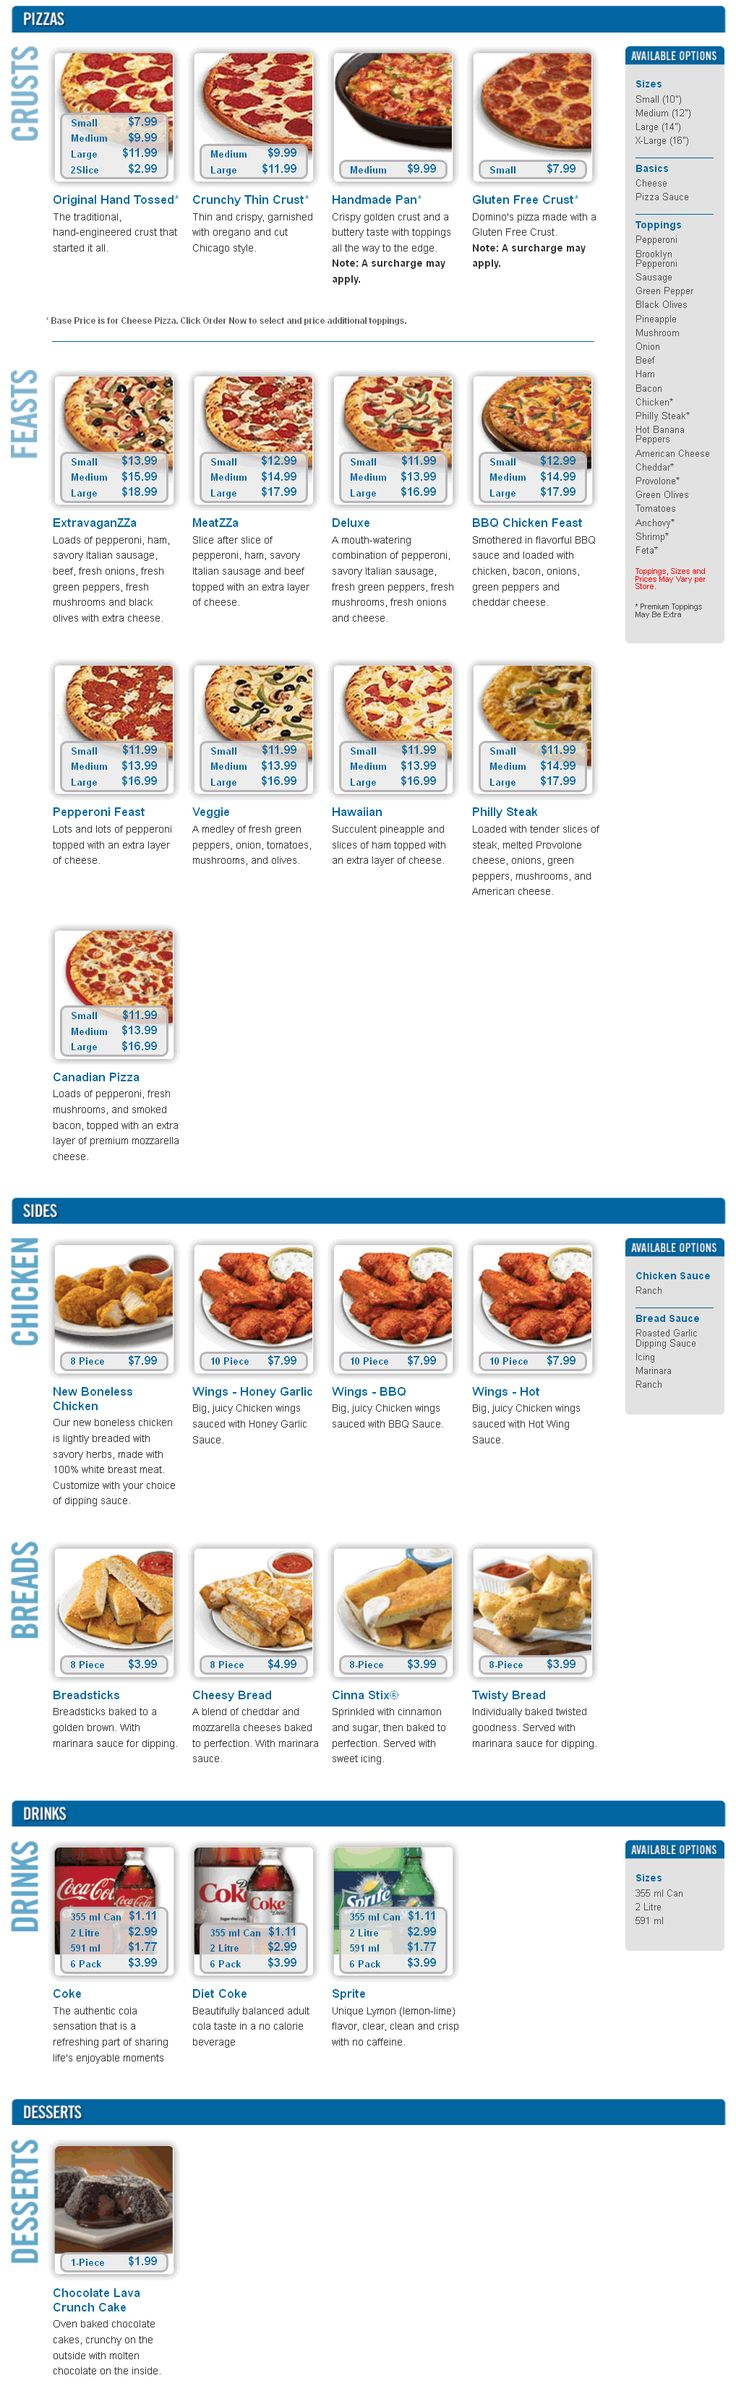 Dominos Pizza Menu (Danforth Ave Location)